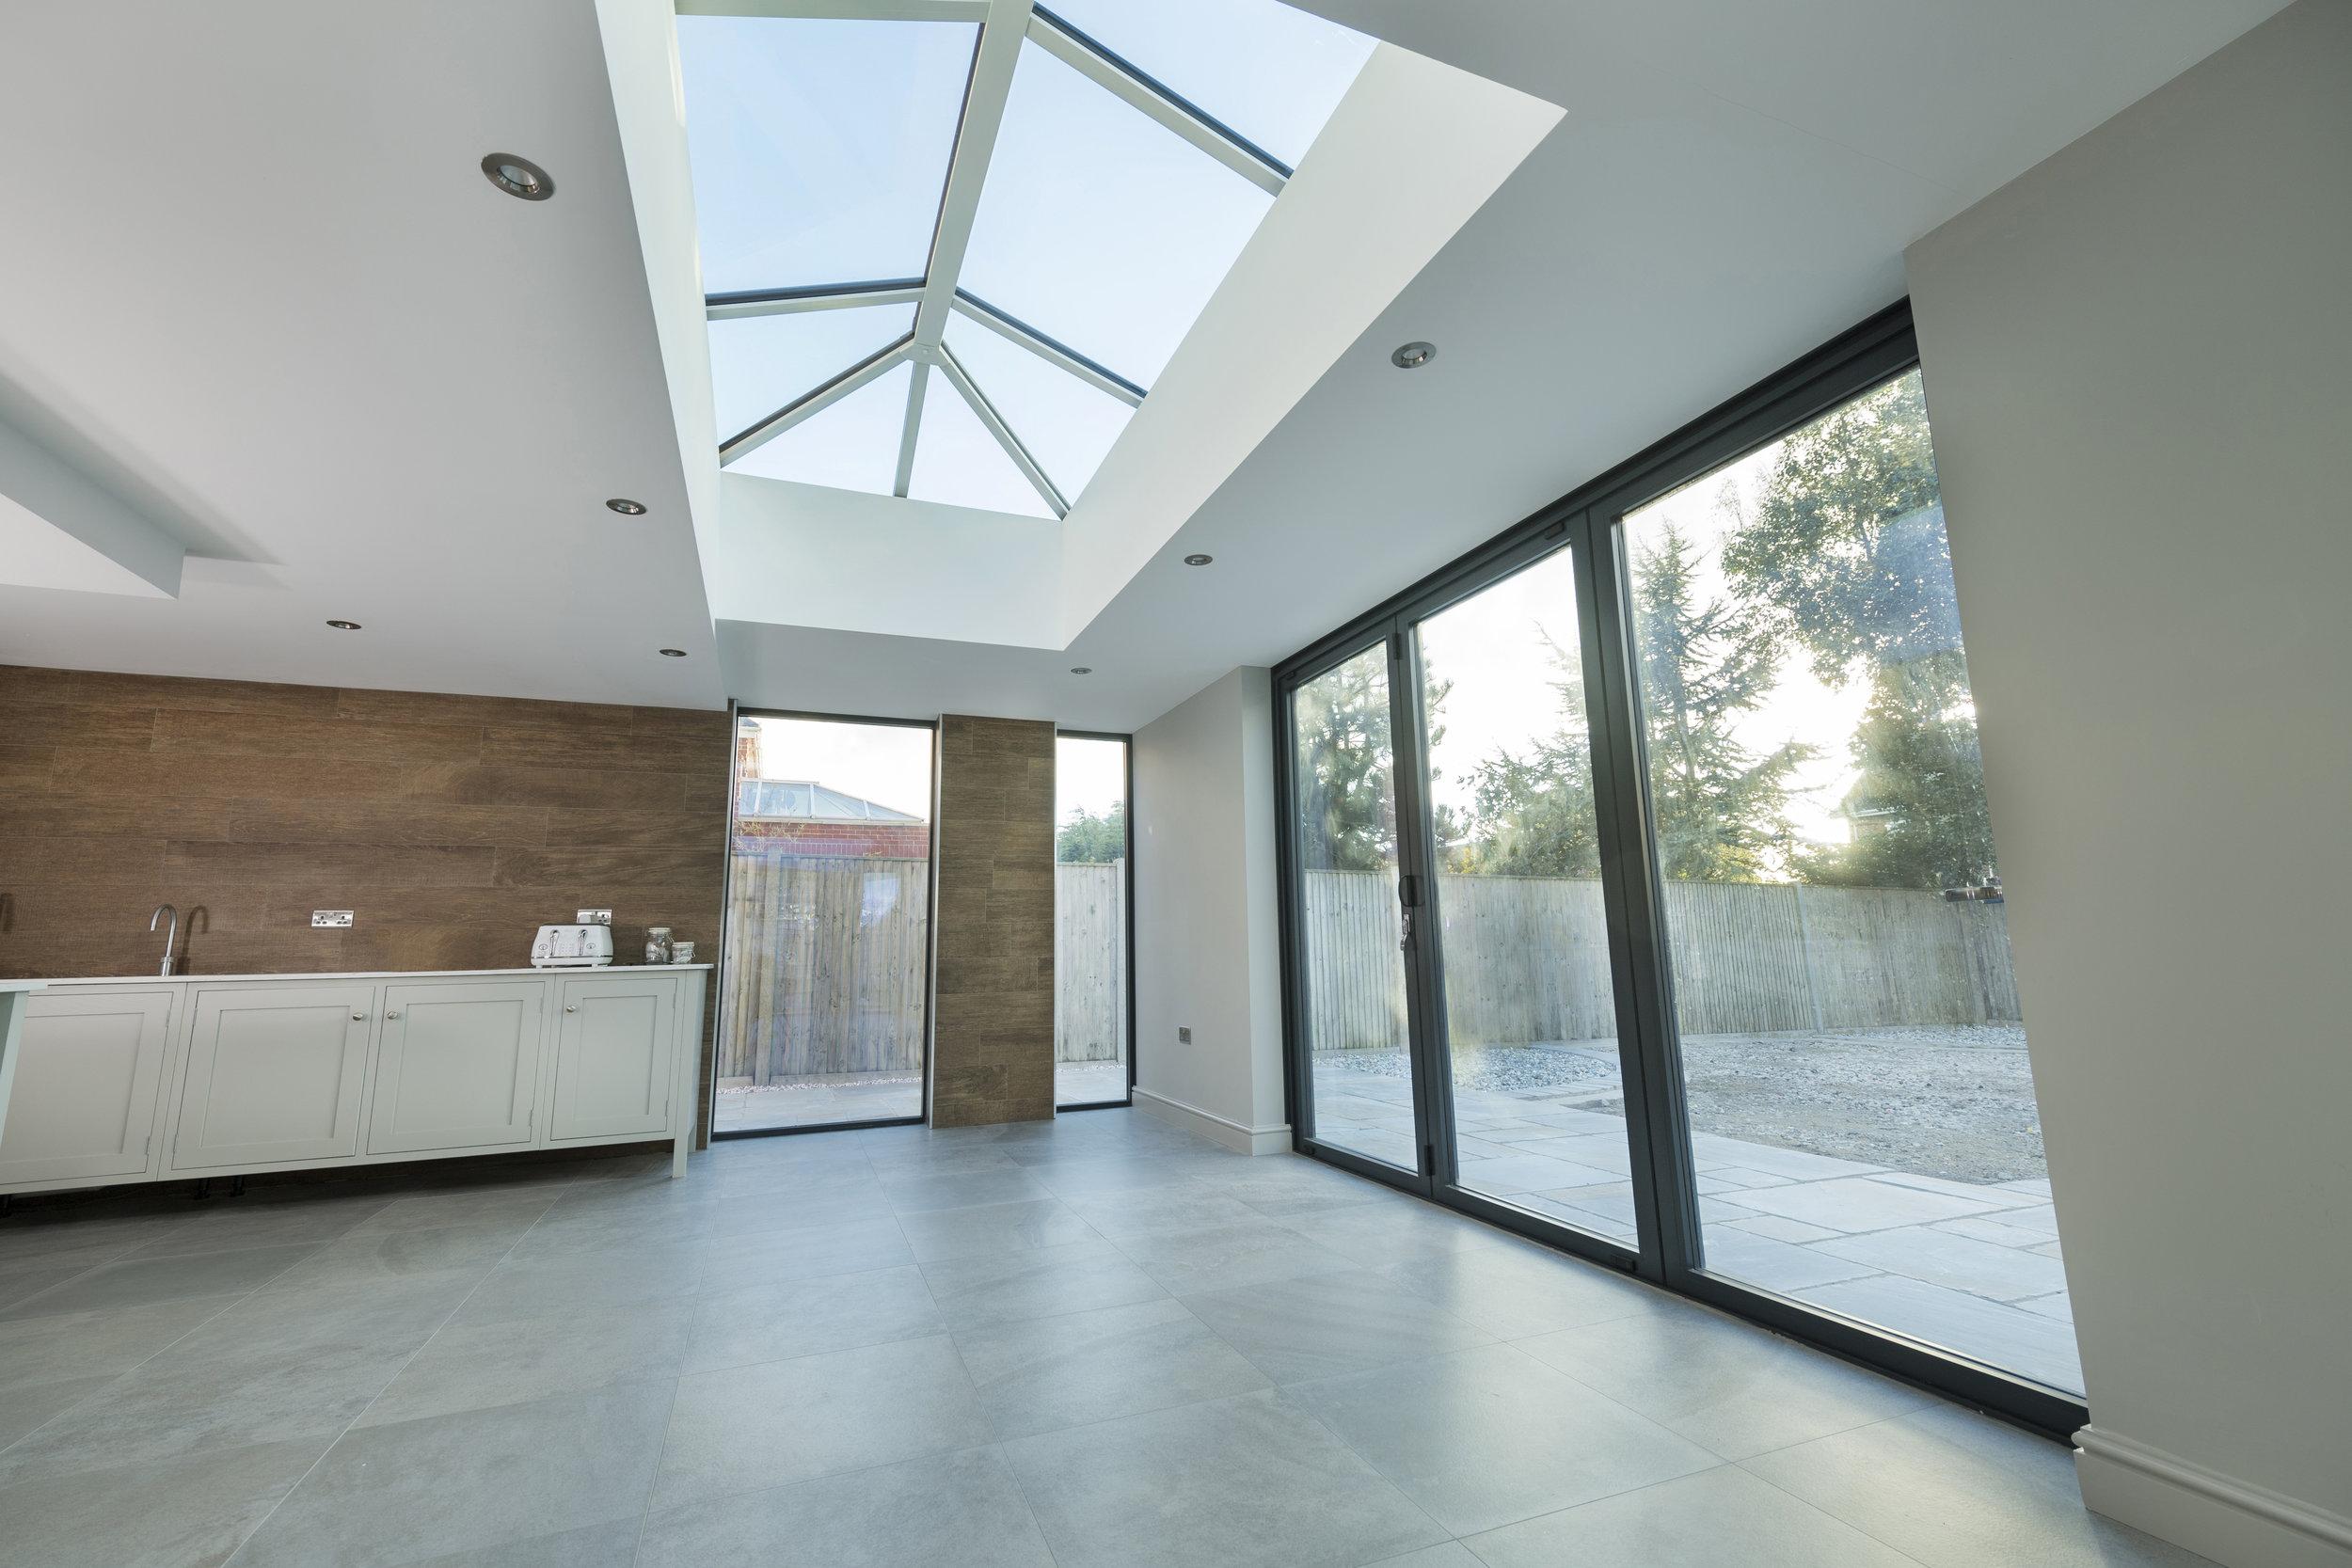 The purpose designed Stratus aluminium lantern roof system is discreet yet stylish